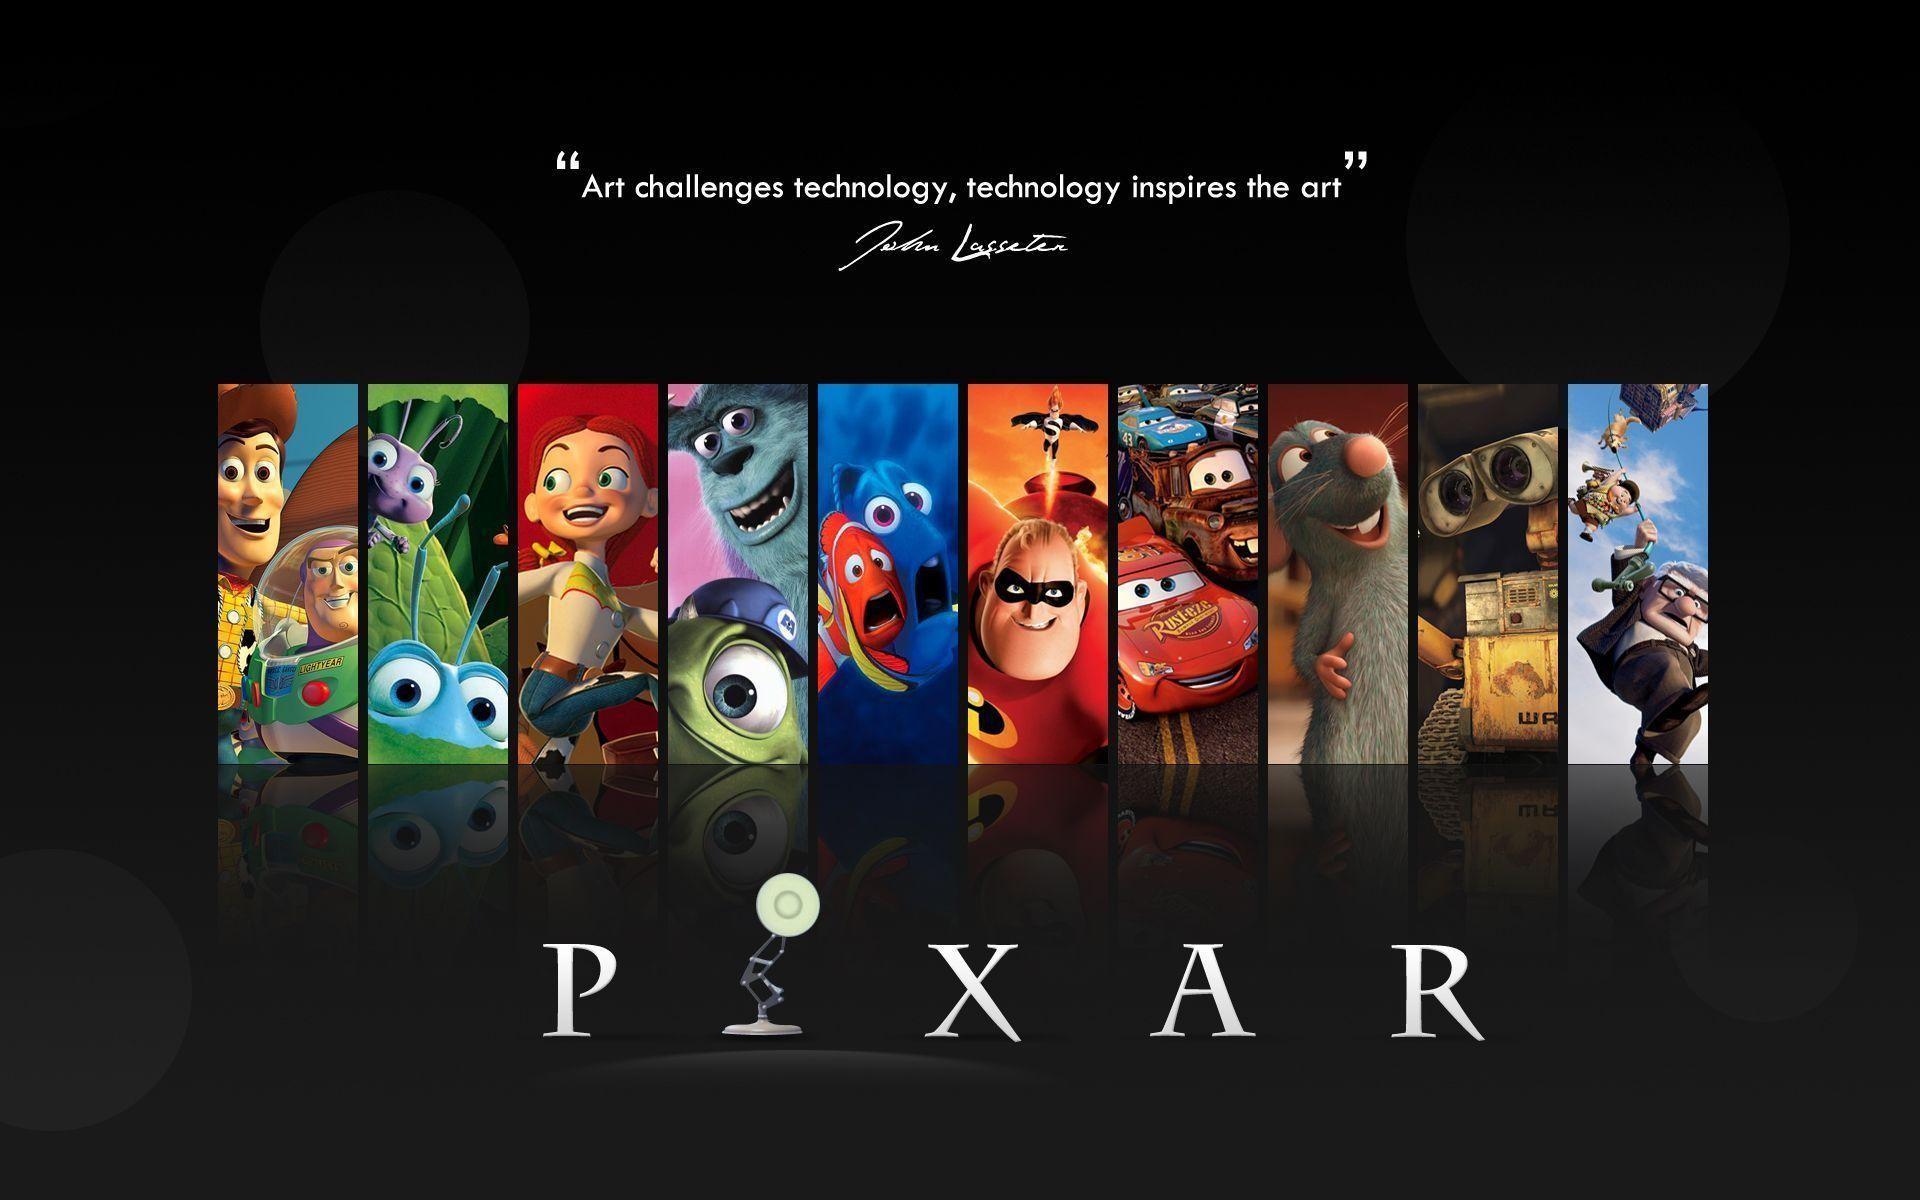 Disney Pixar Up Wallpapers Poster Movie Wallpaper 1024x768PX .